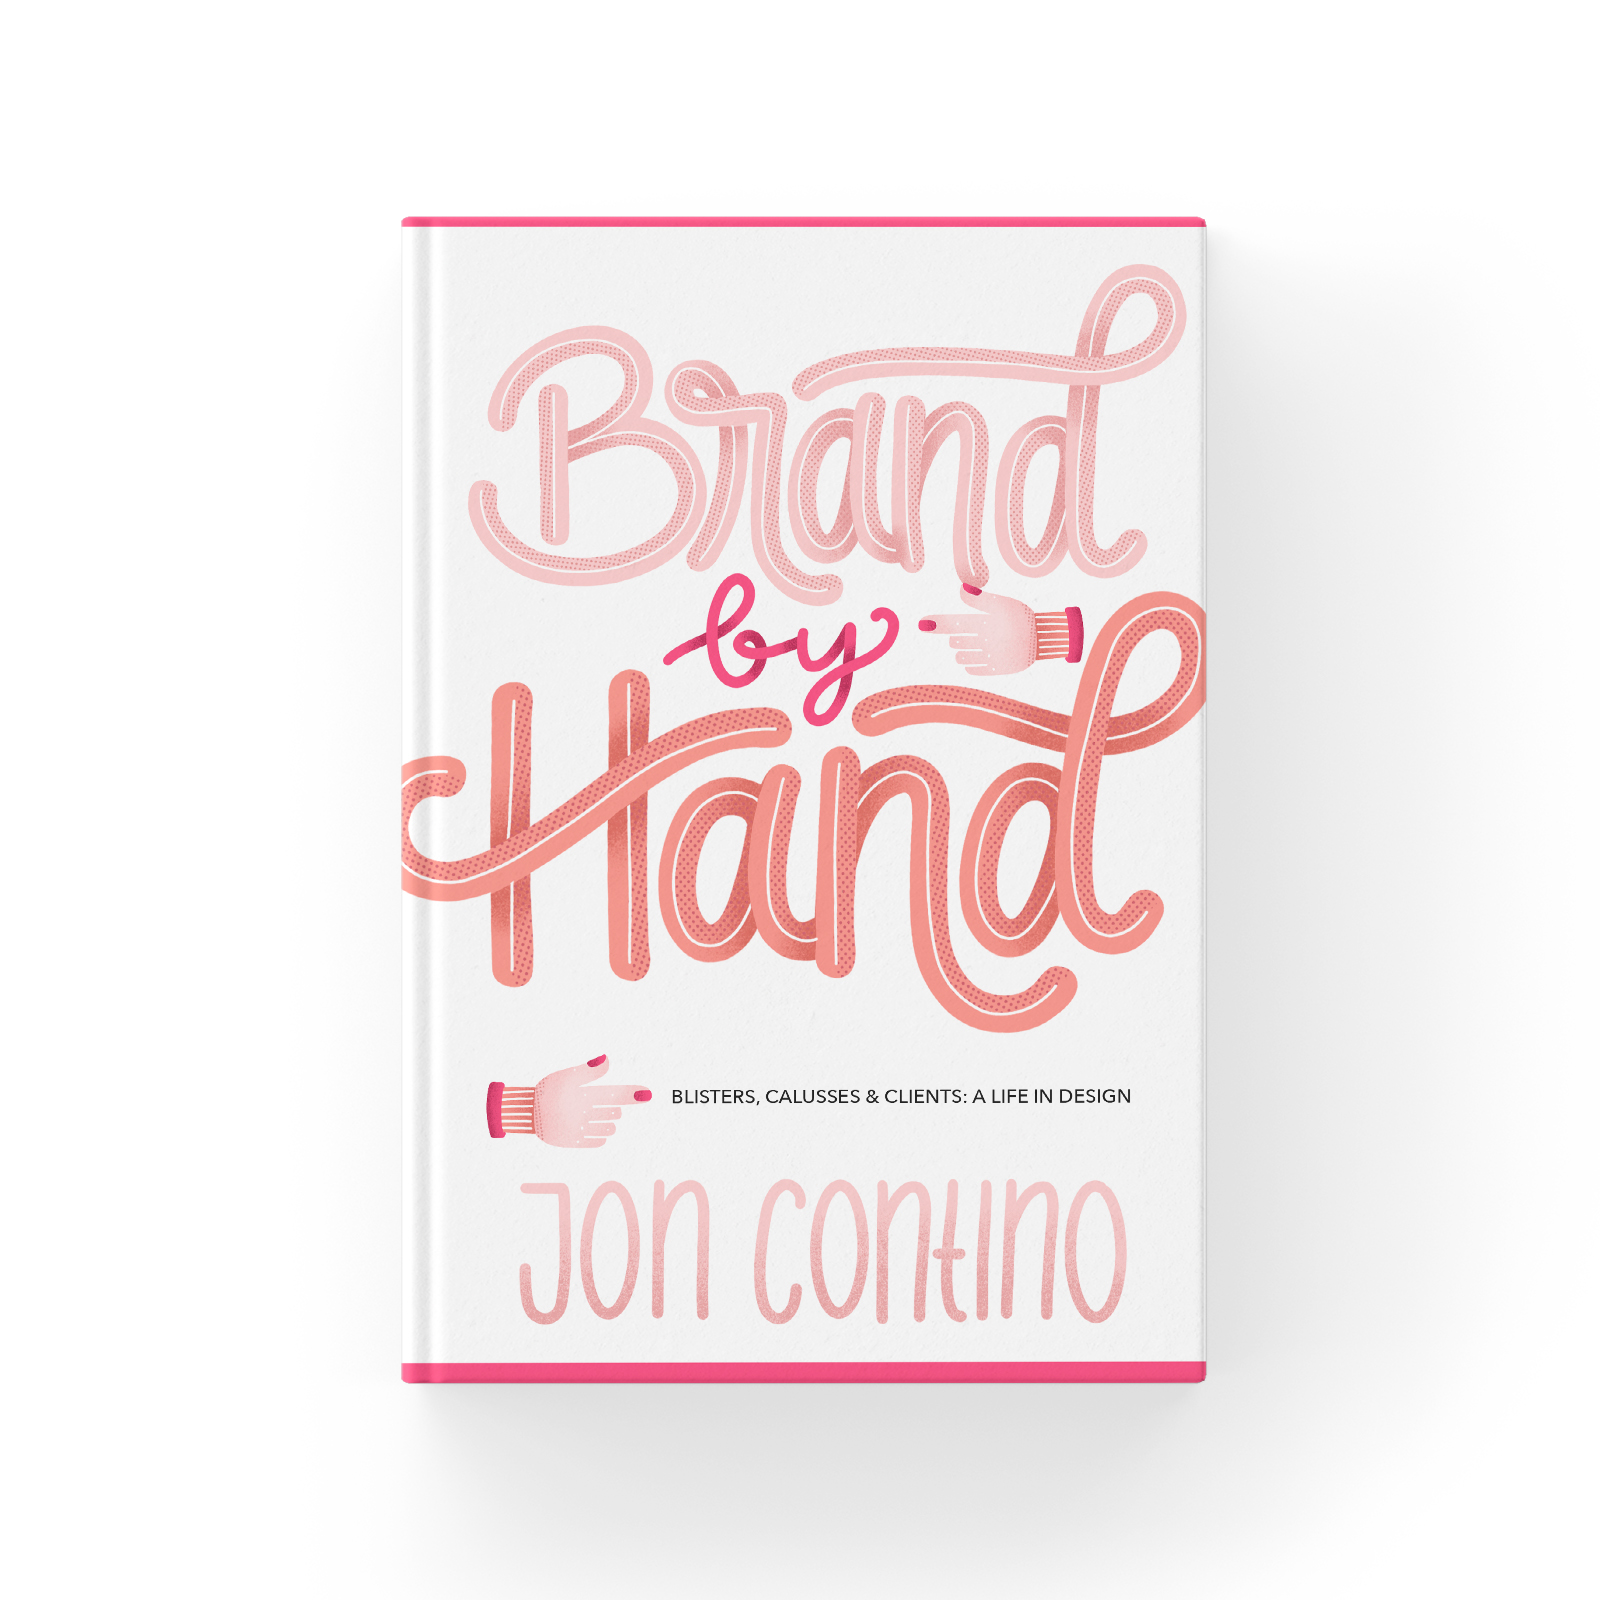 Lettering, Handlettering, Digitales Lettering, Ipad Lettering, Design, Buchcover, Illustration, Buchcover Design, Typografie, Lettering